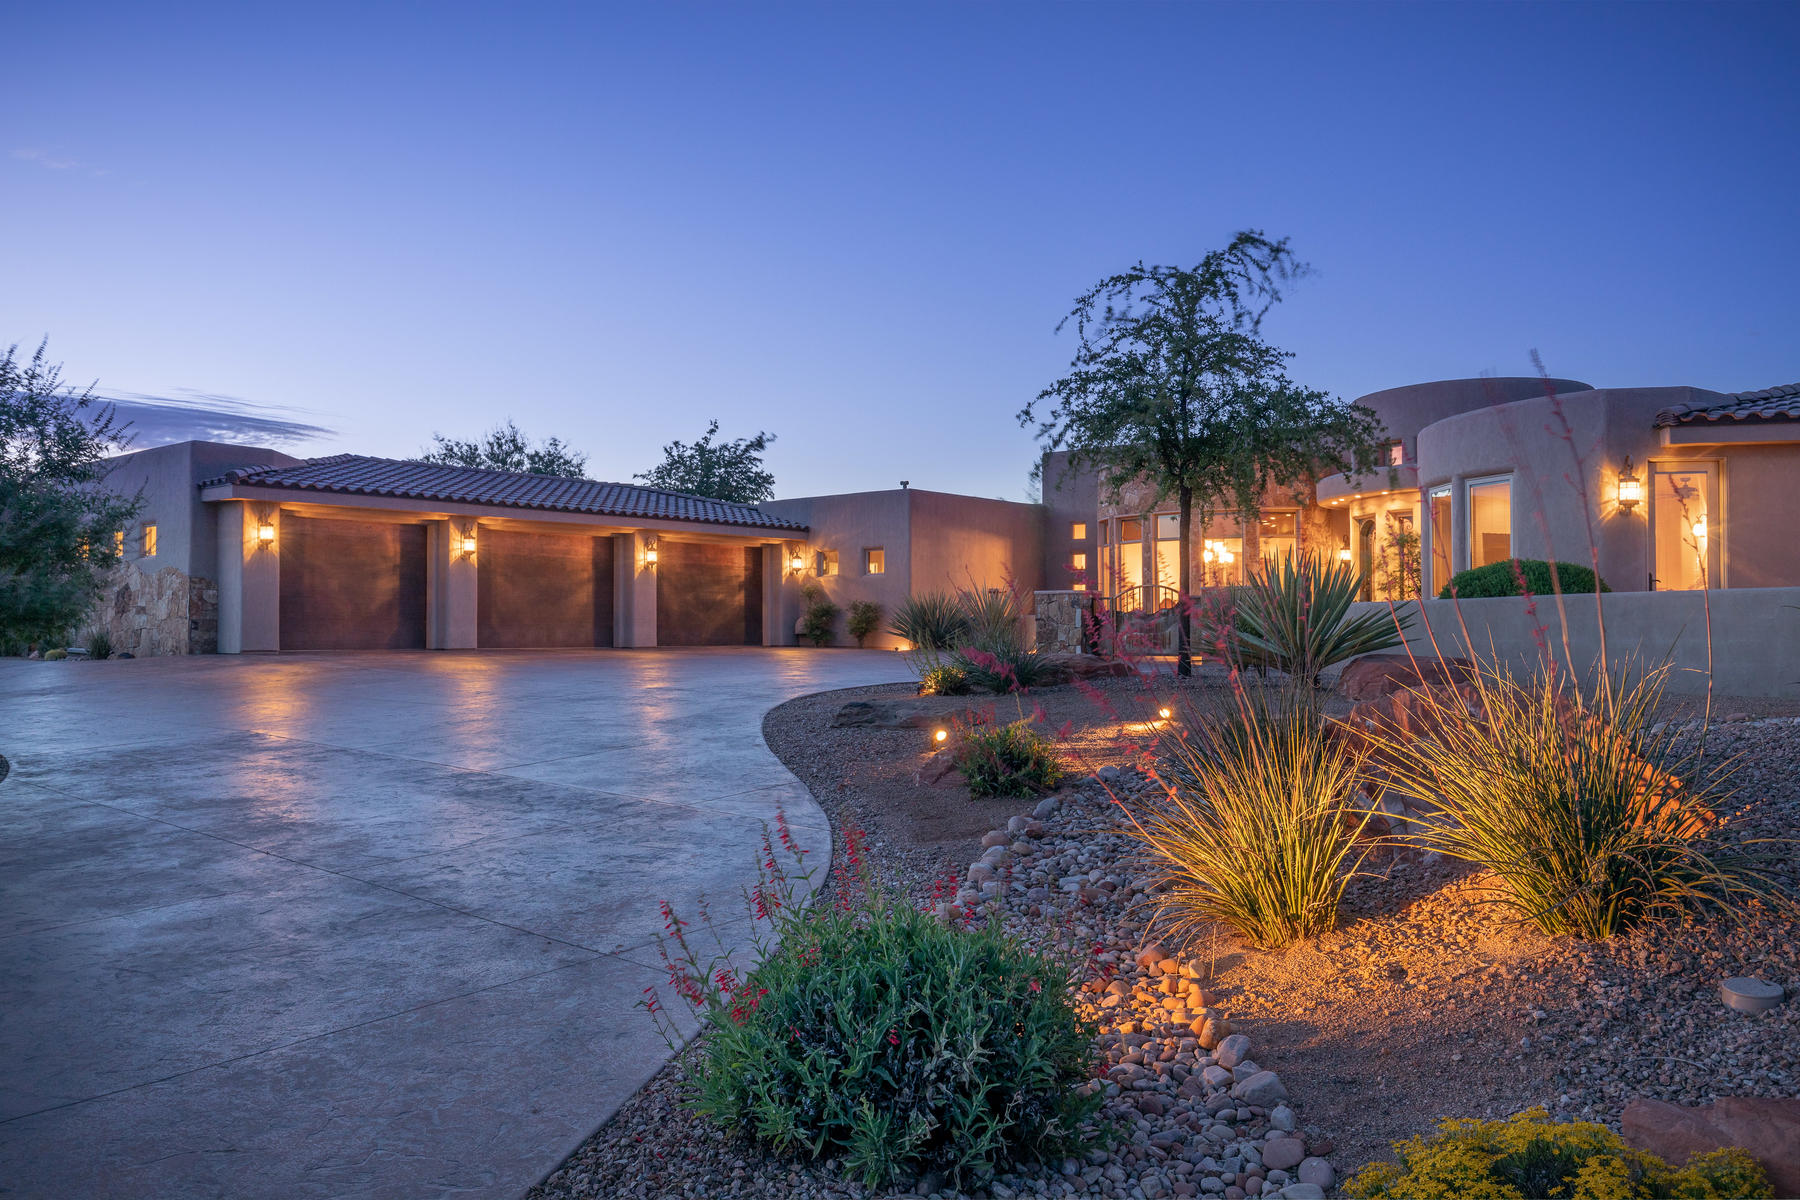 Single Family Homes for Sale at Desert Sky At The Ledges 2096 W Long Sky Dr St. George, Utah 84770 United States